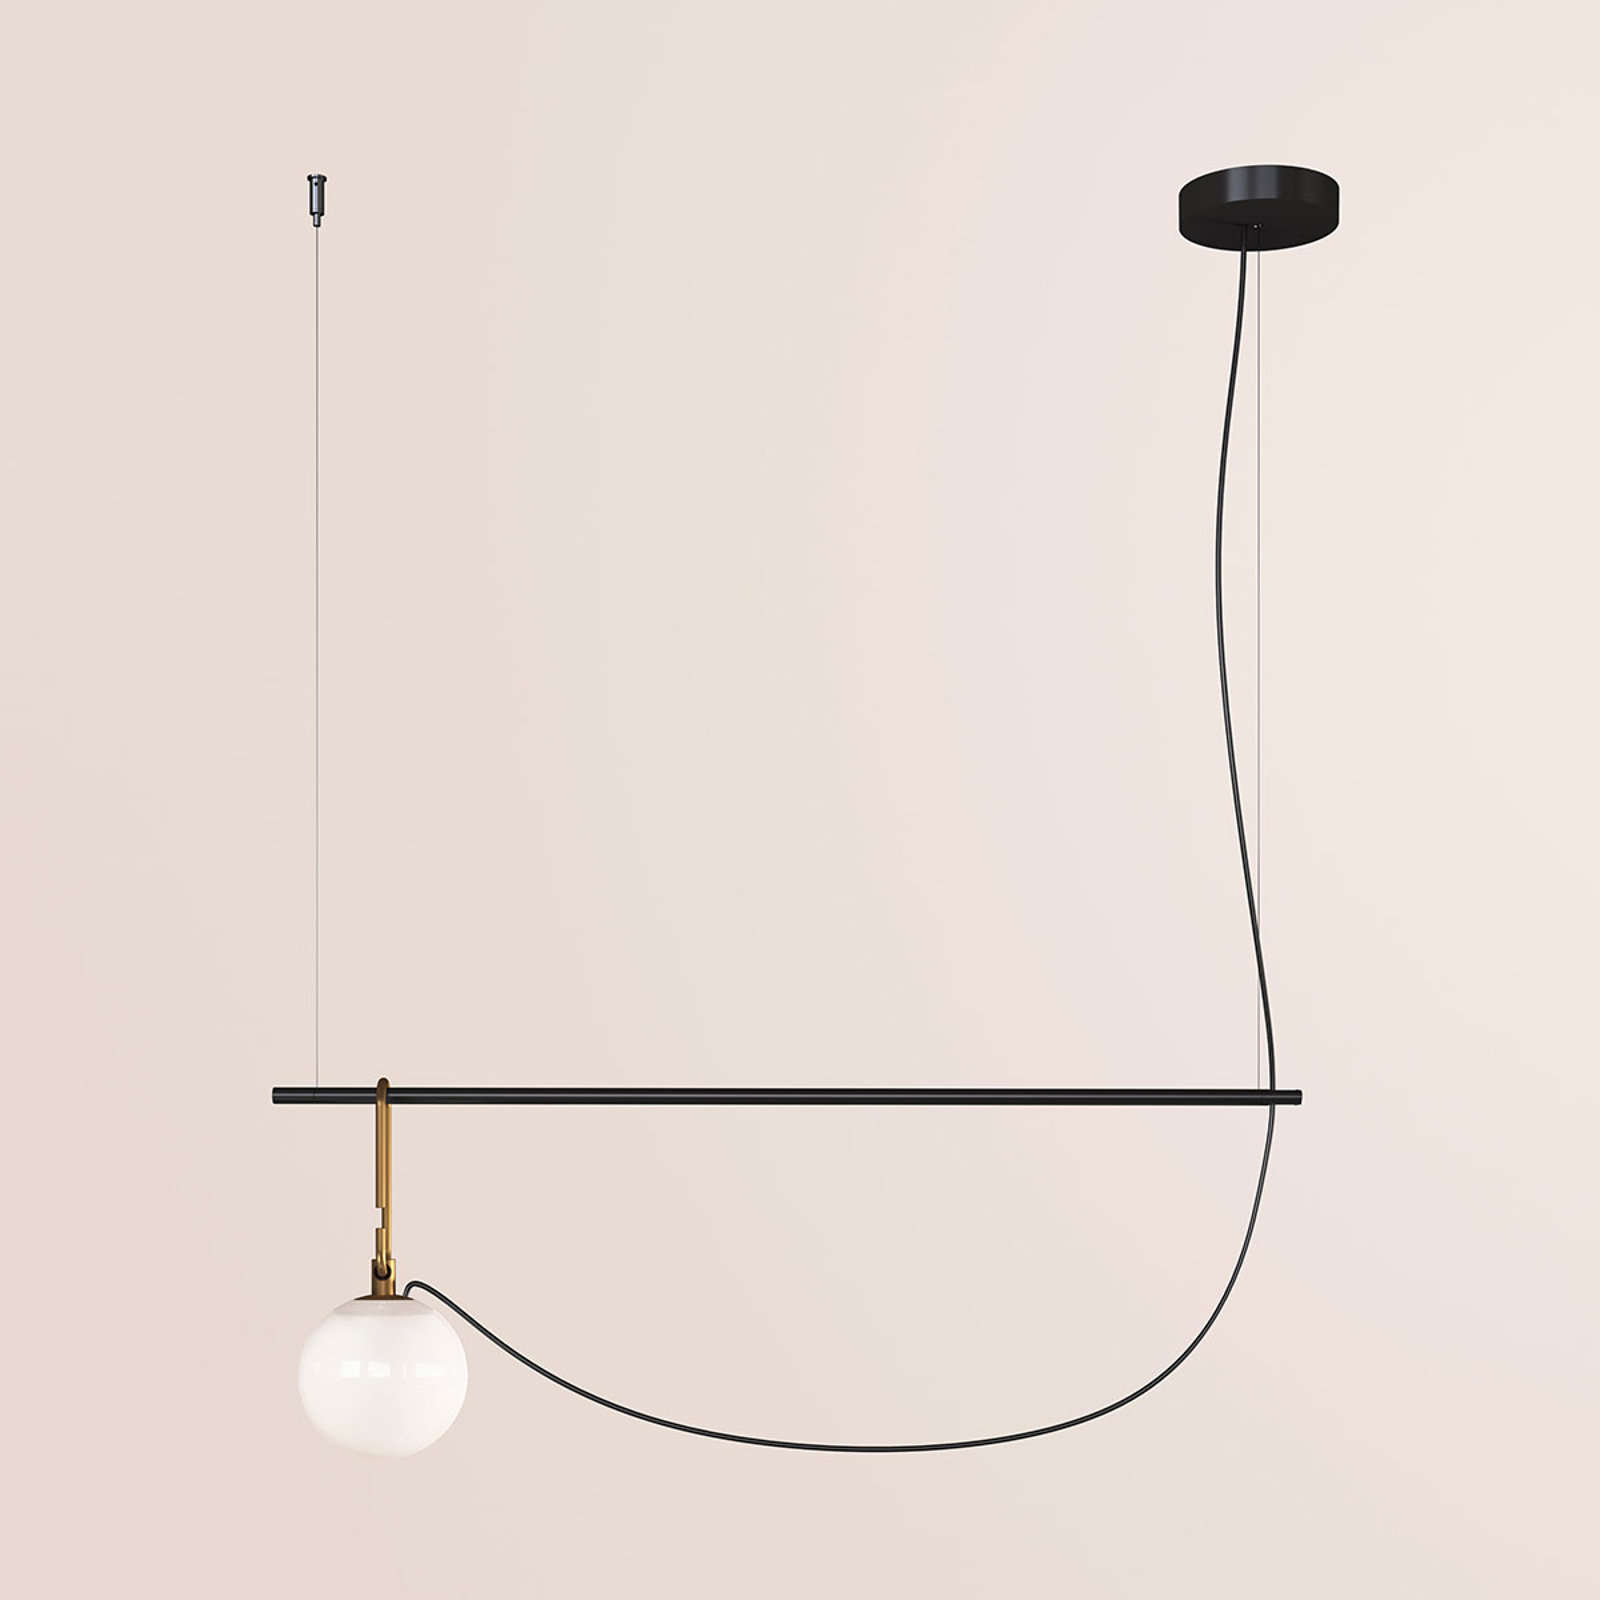 Artemide nh S2 14 hanglamp 90,5 cm bol Ø 14cm